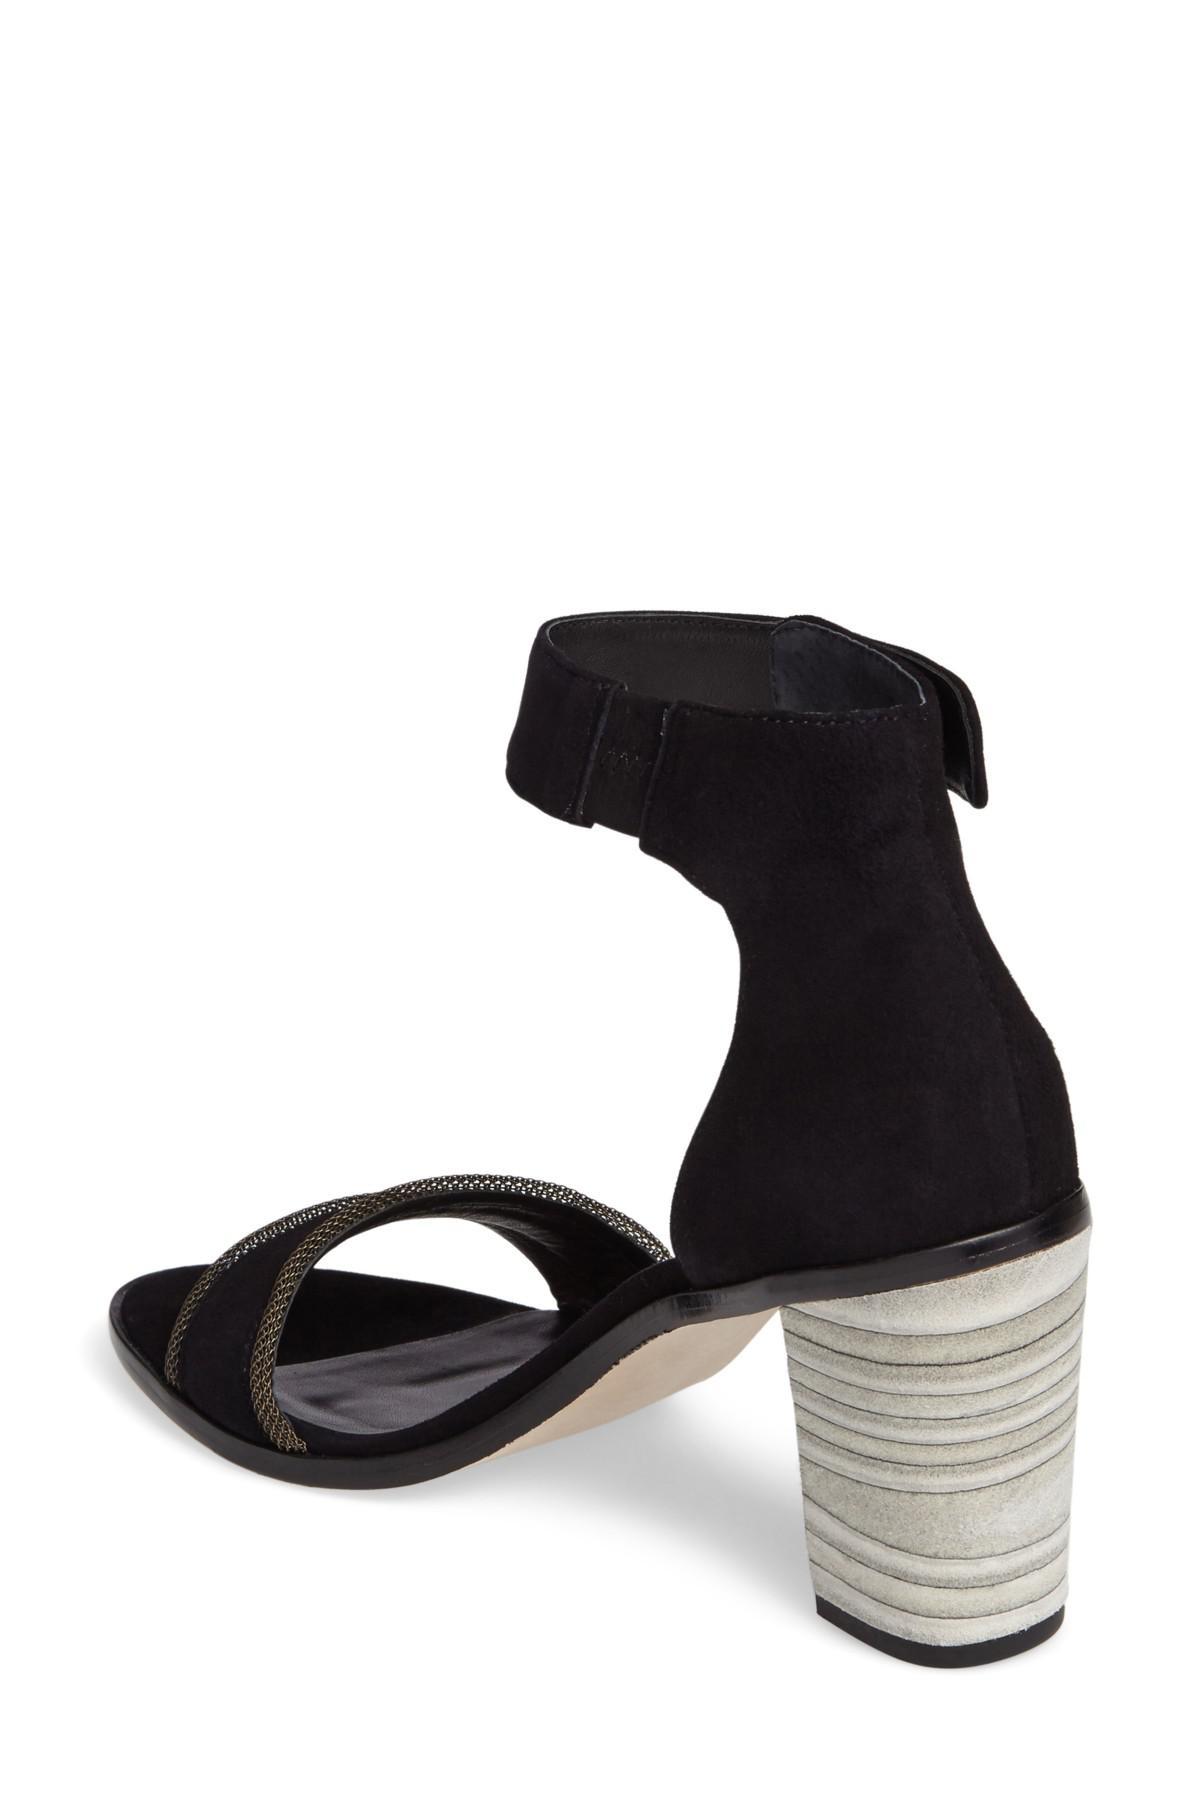 b58c75c850f Lyst - Bernardo Hayden Ankle Strap Sandal in Black